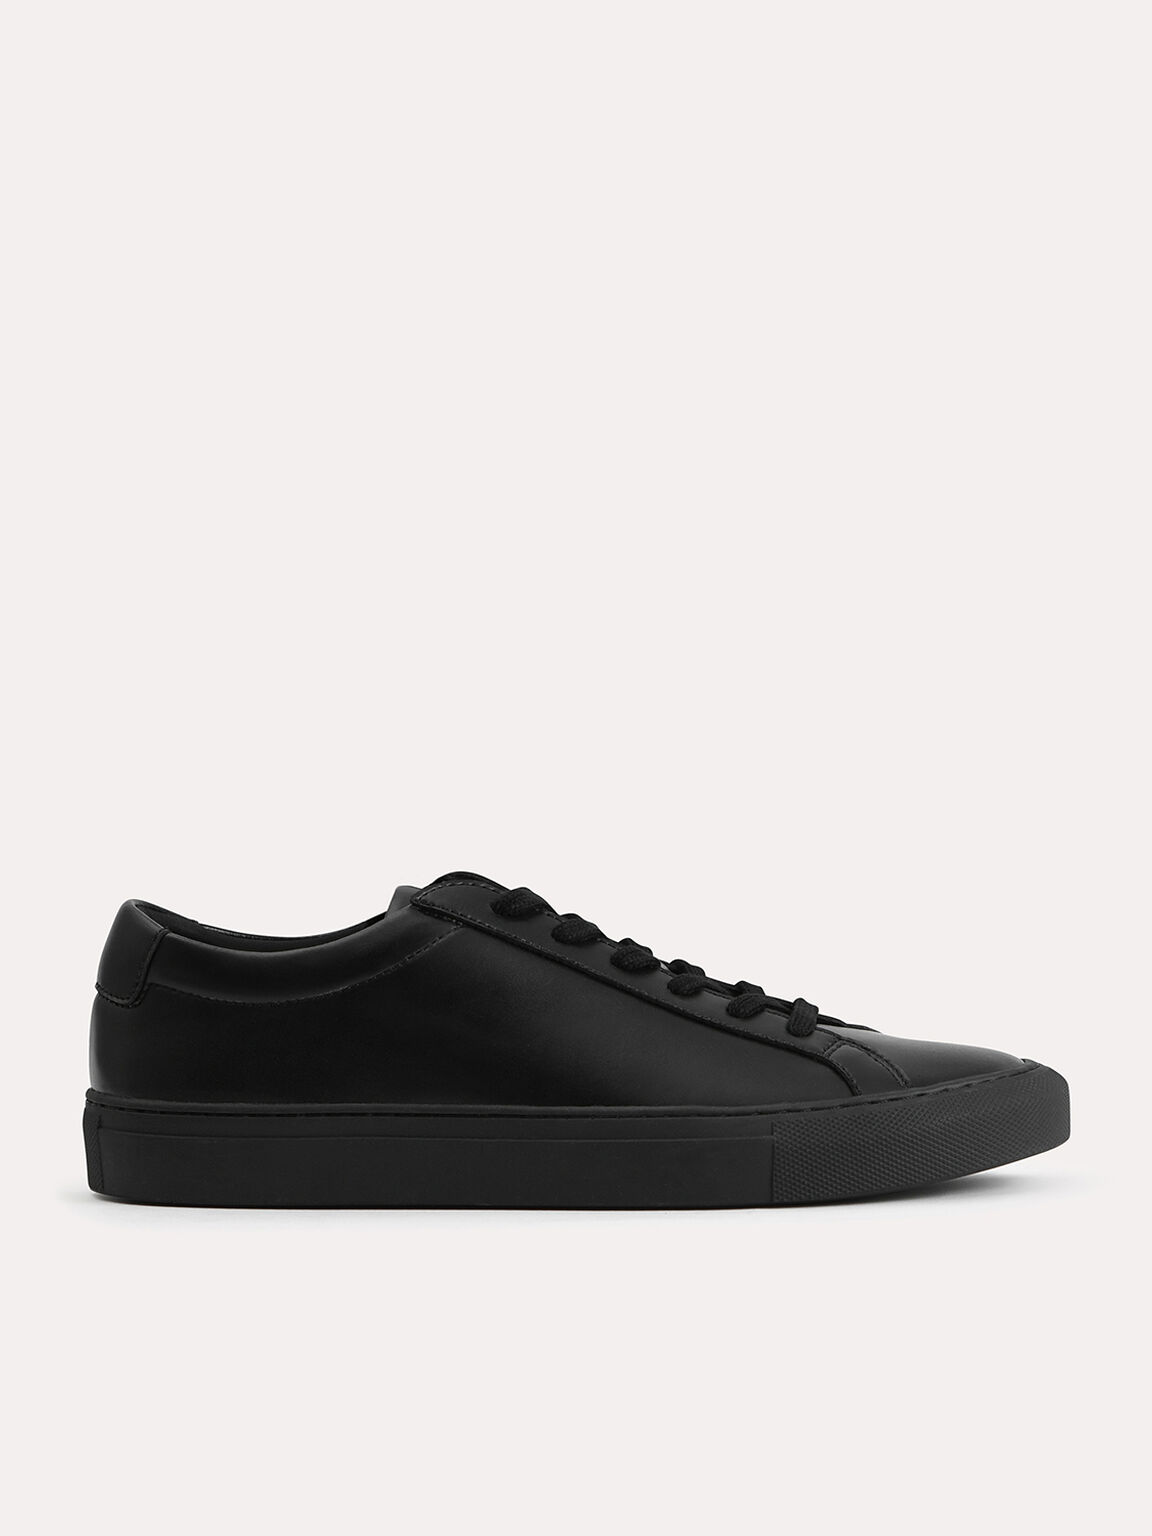 Atlas Court Sneakers, Black, hi-res